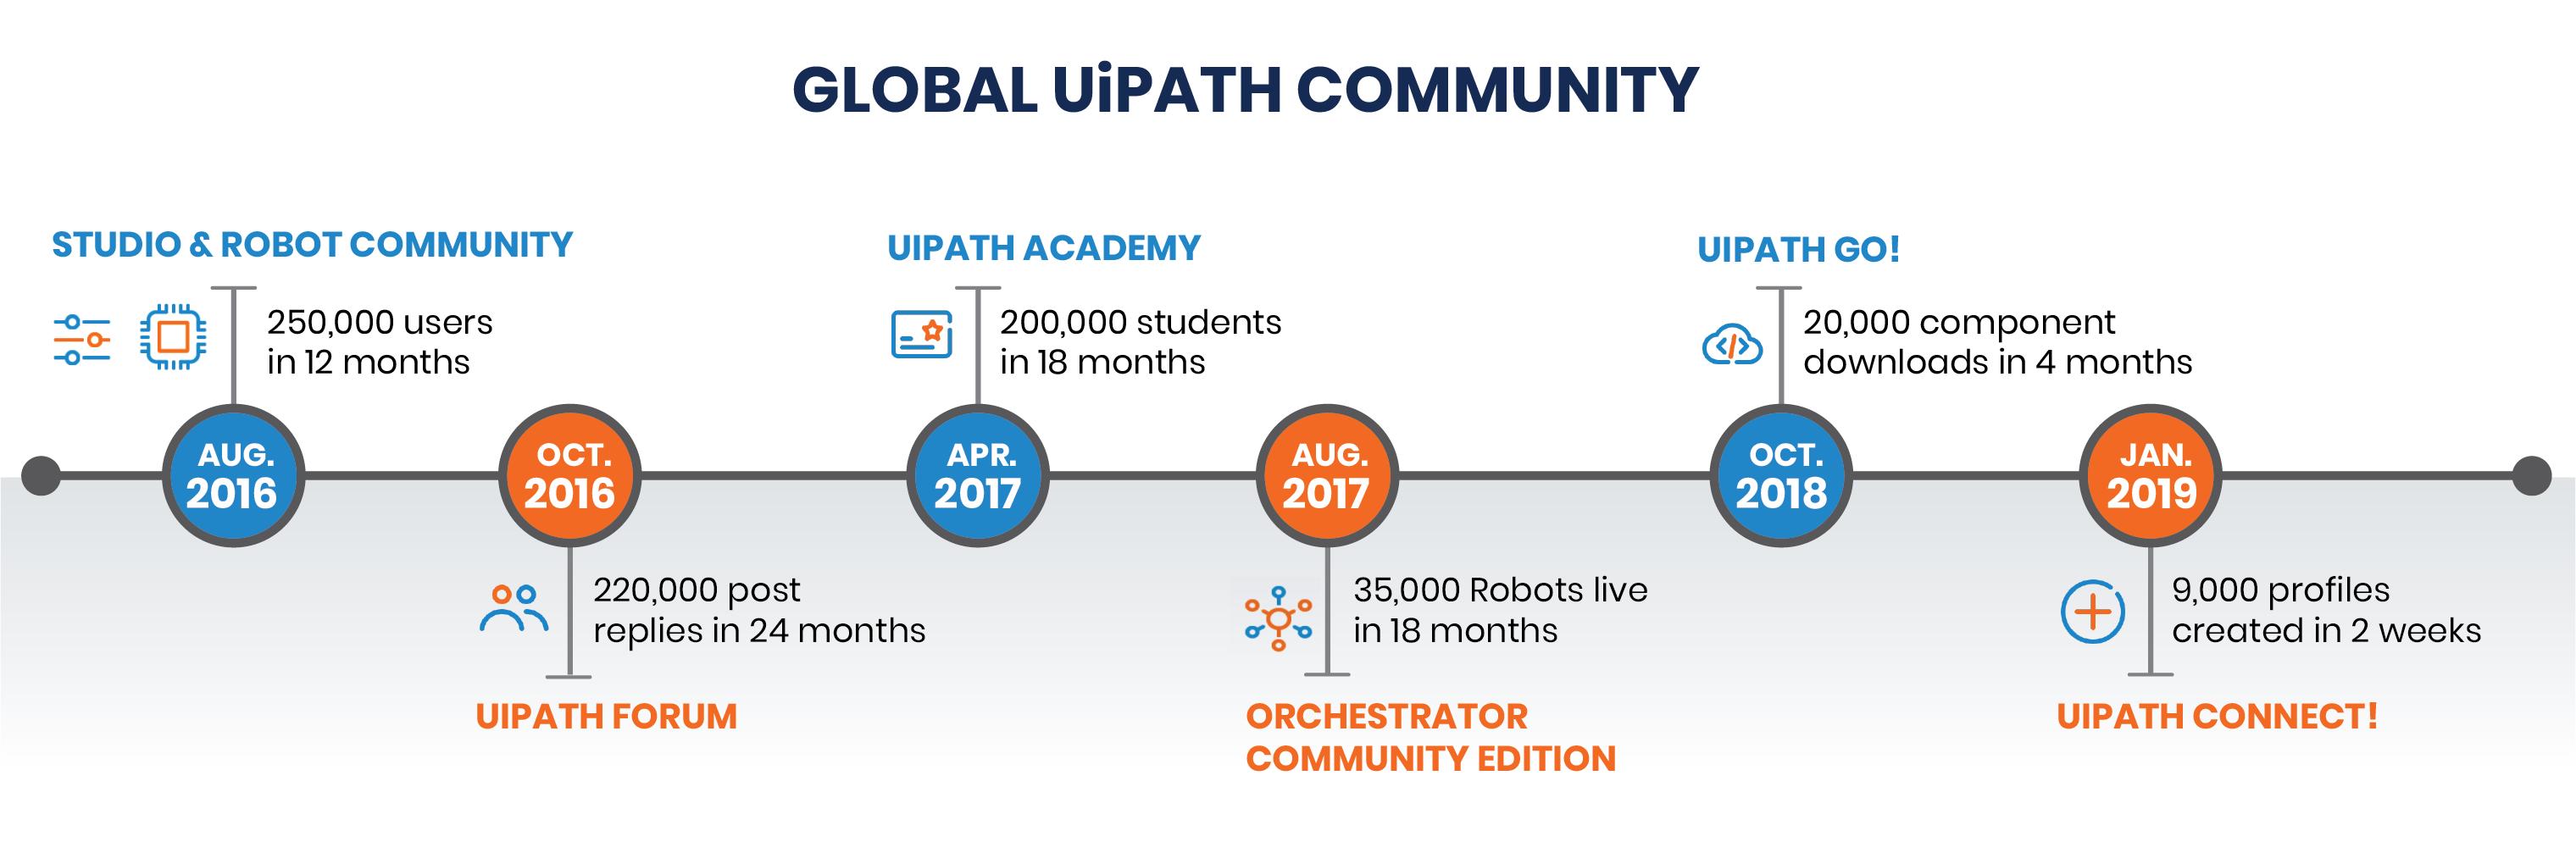 Global-Community-timeline